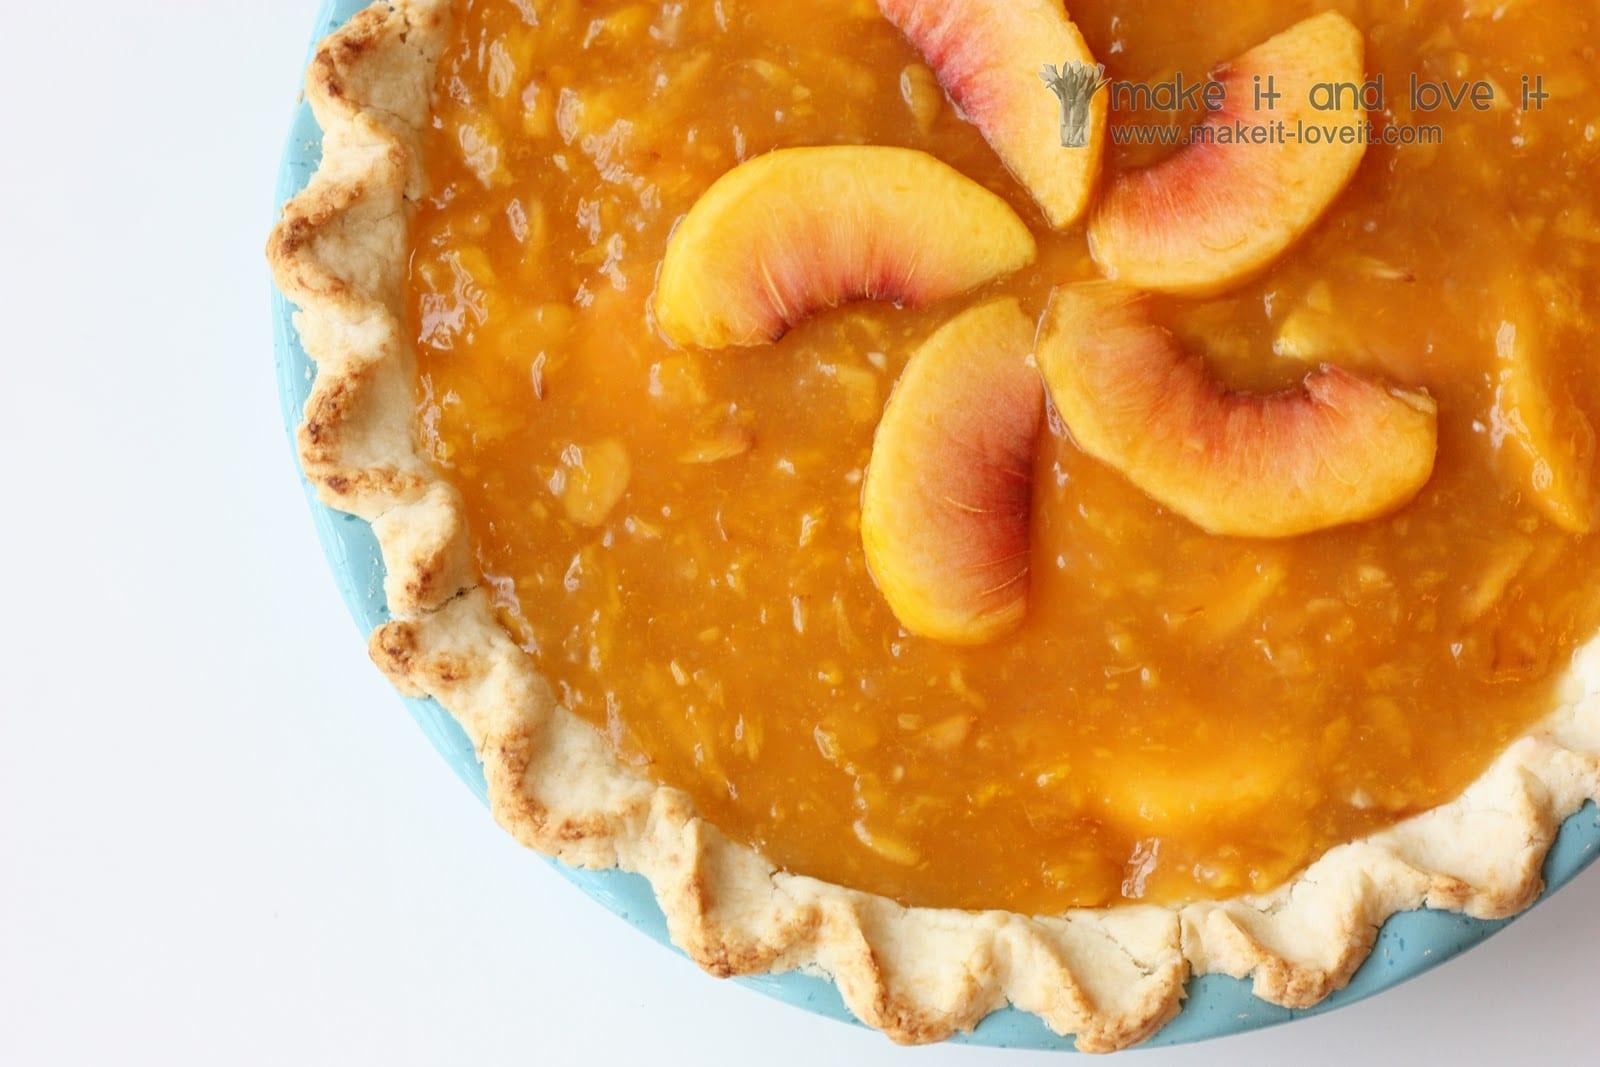 A bit of nostalgia and some delicious Peach Pie